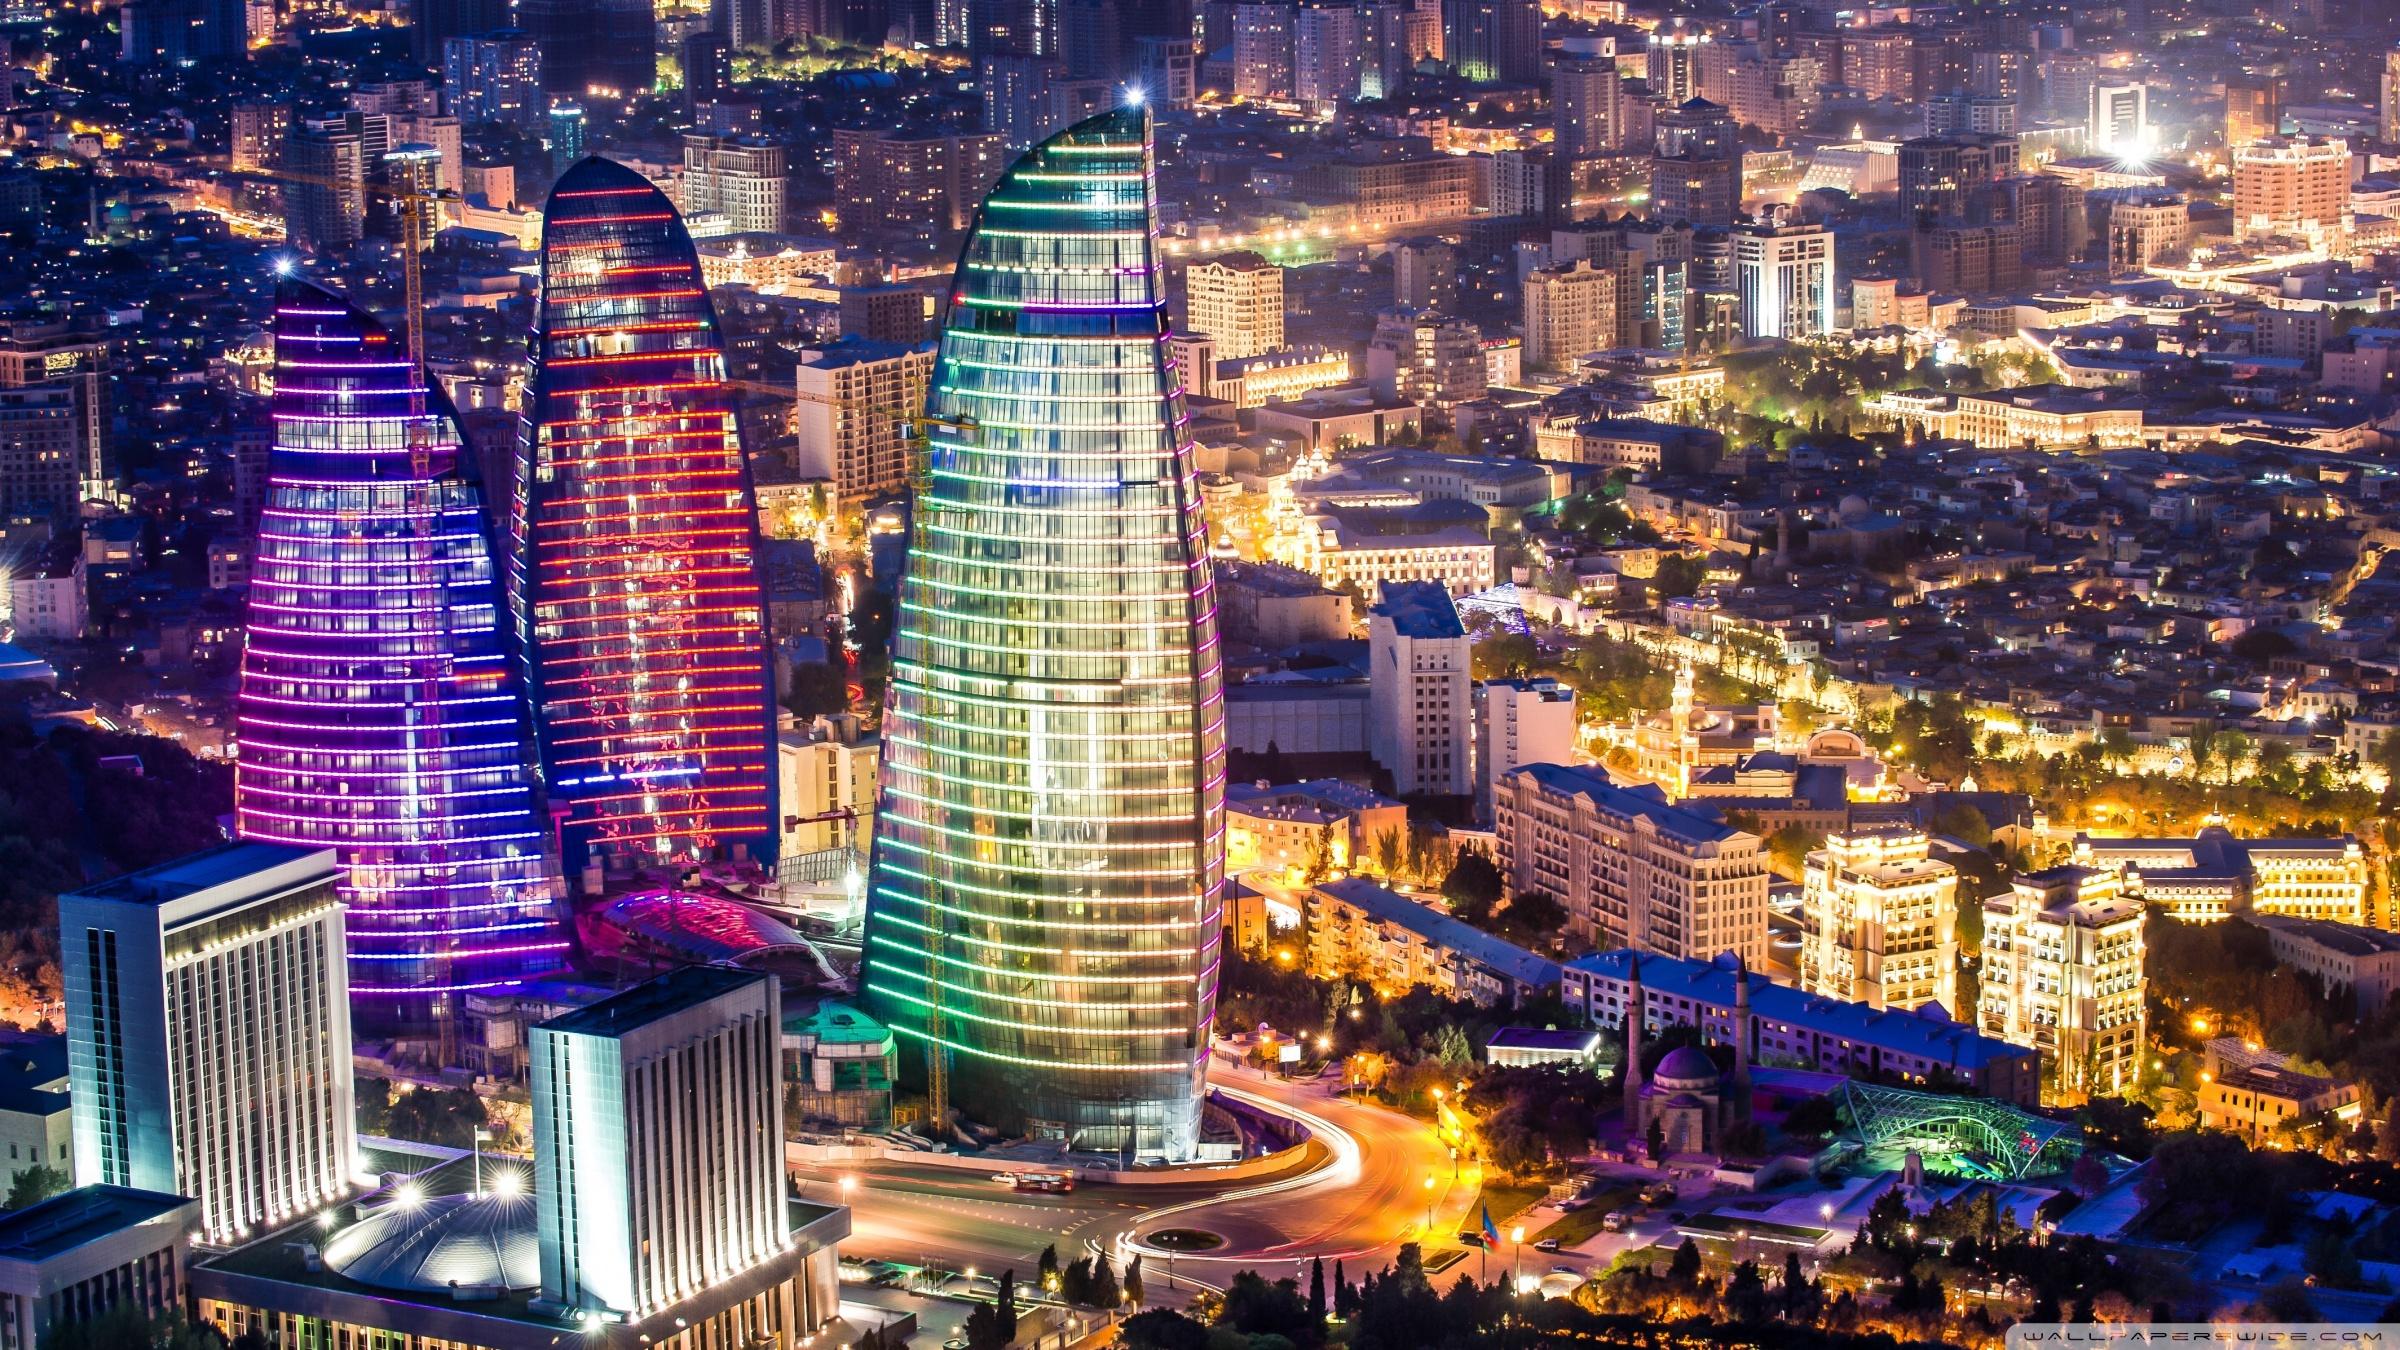 Flame Towers Baku Azerbaijan 4K HD Desktop Wallpaper for 2400x1350